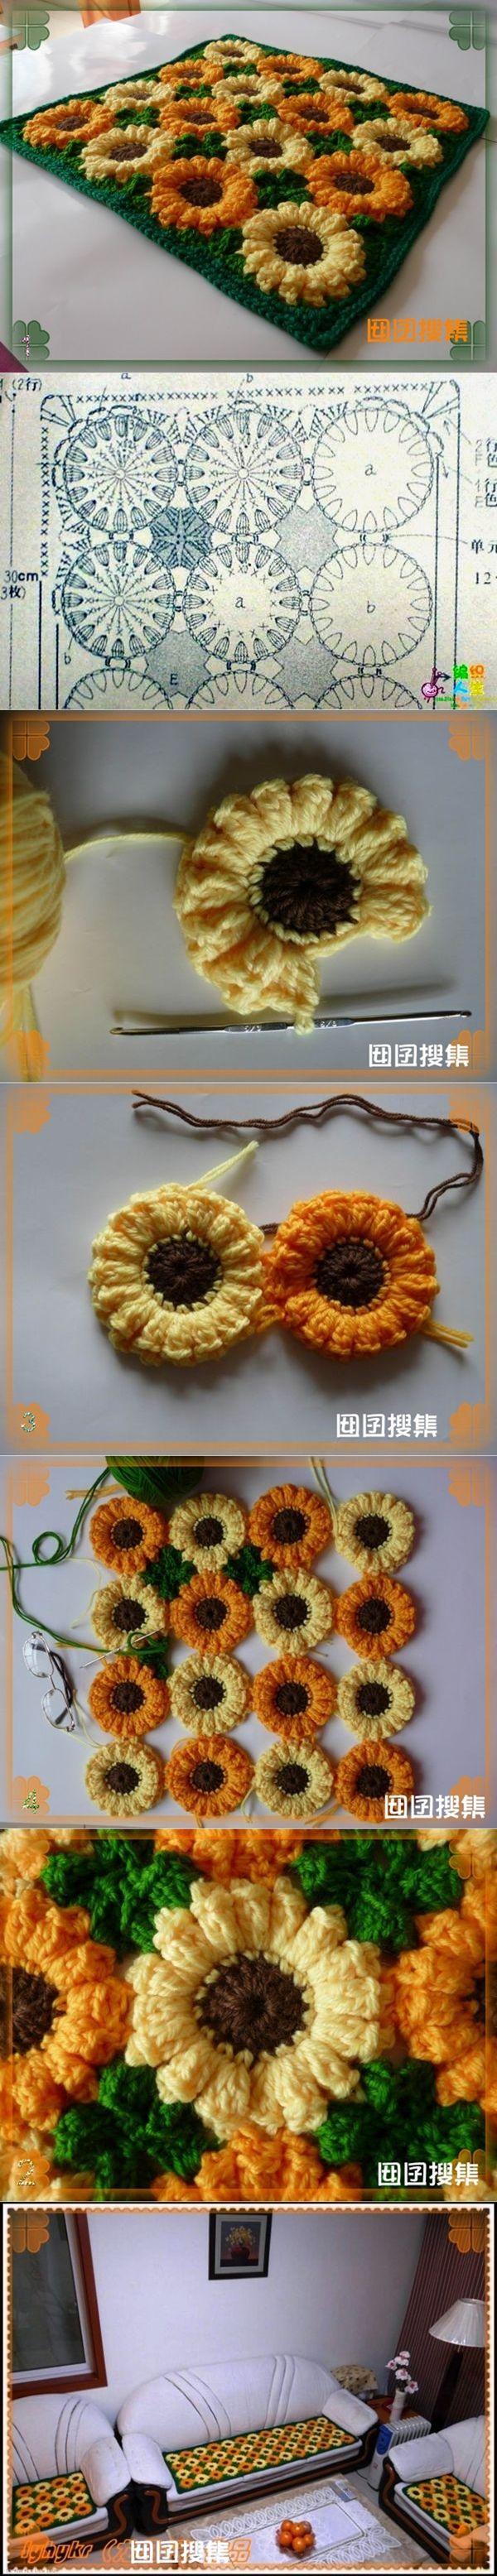 Wonderful DIY Crochet Sunflower Rug | Crochet sunflower, Diy crochet ...